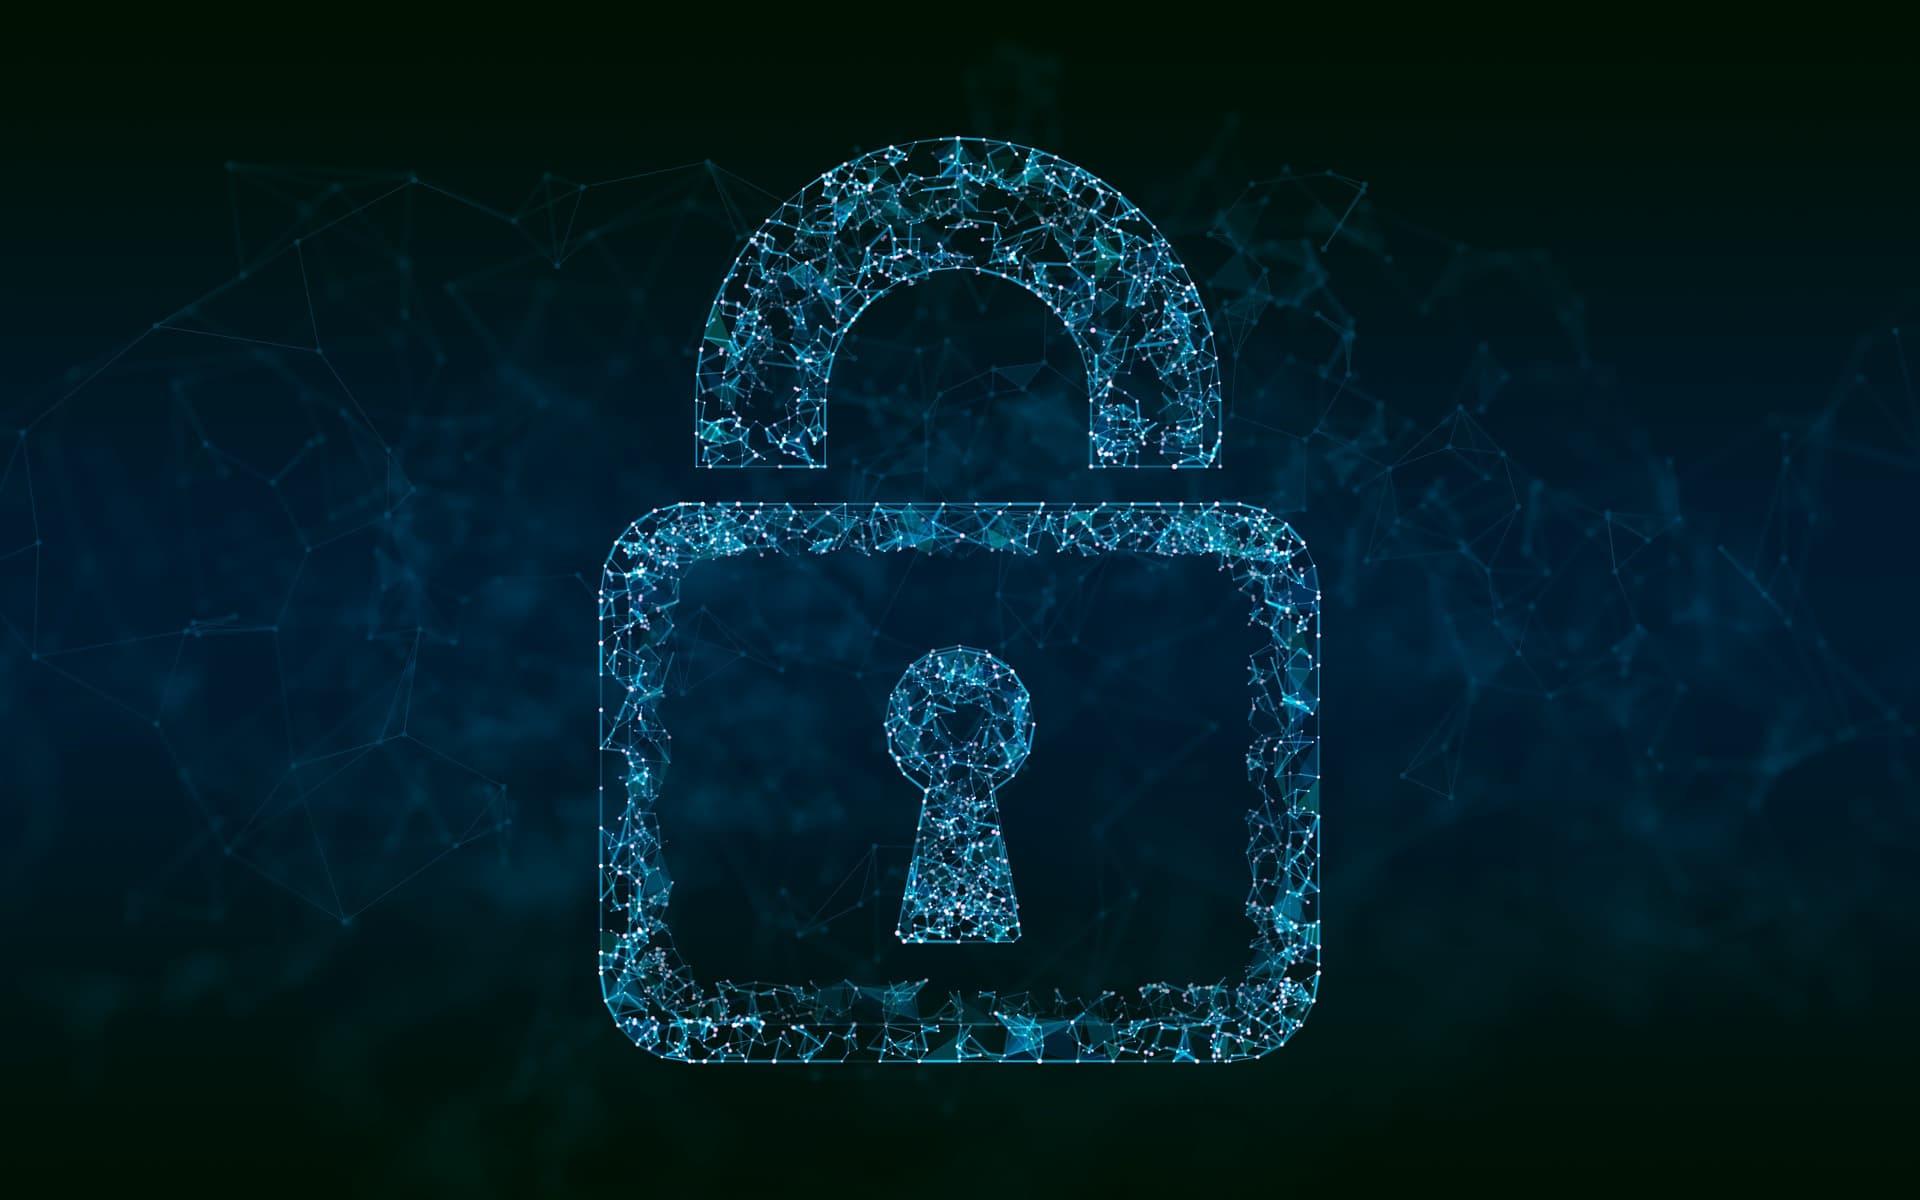 Perché la cyber security è importante?